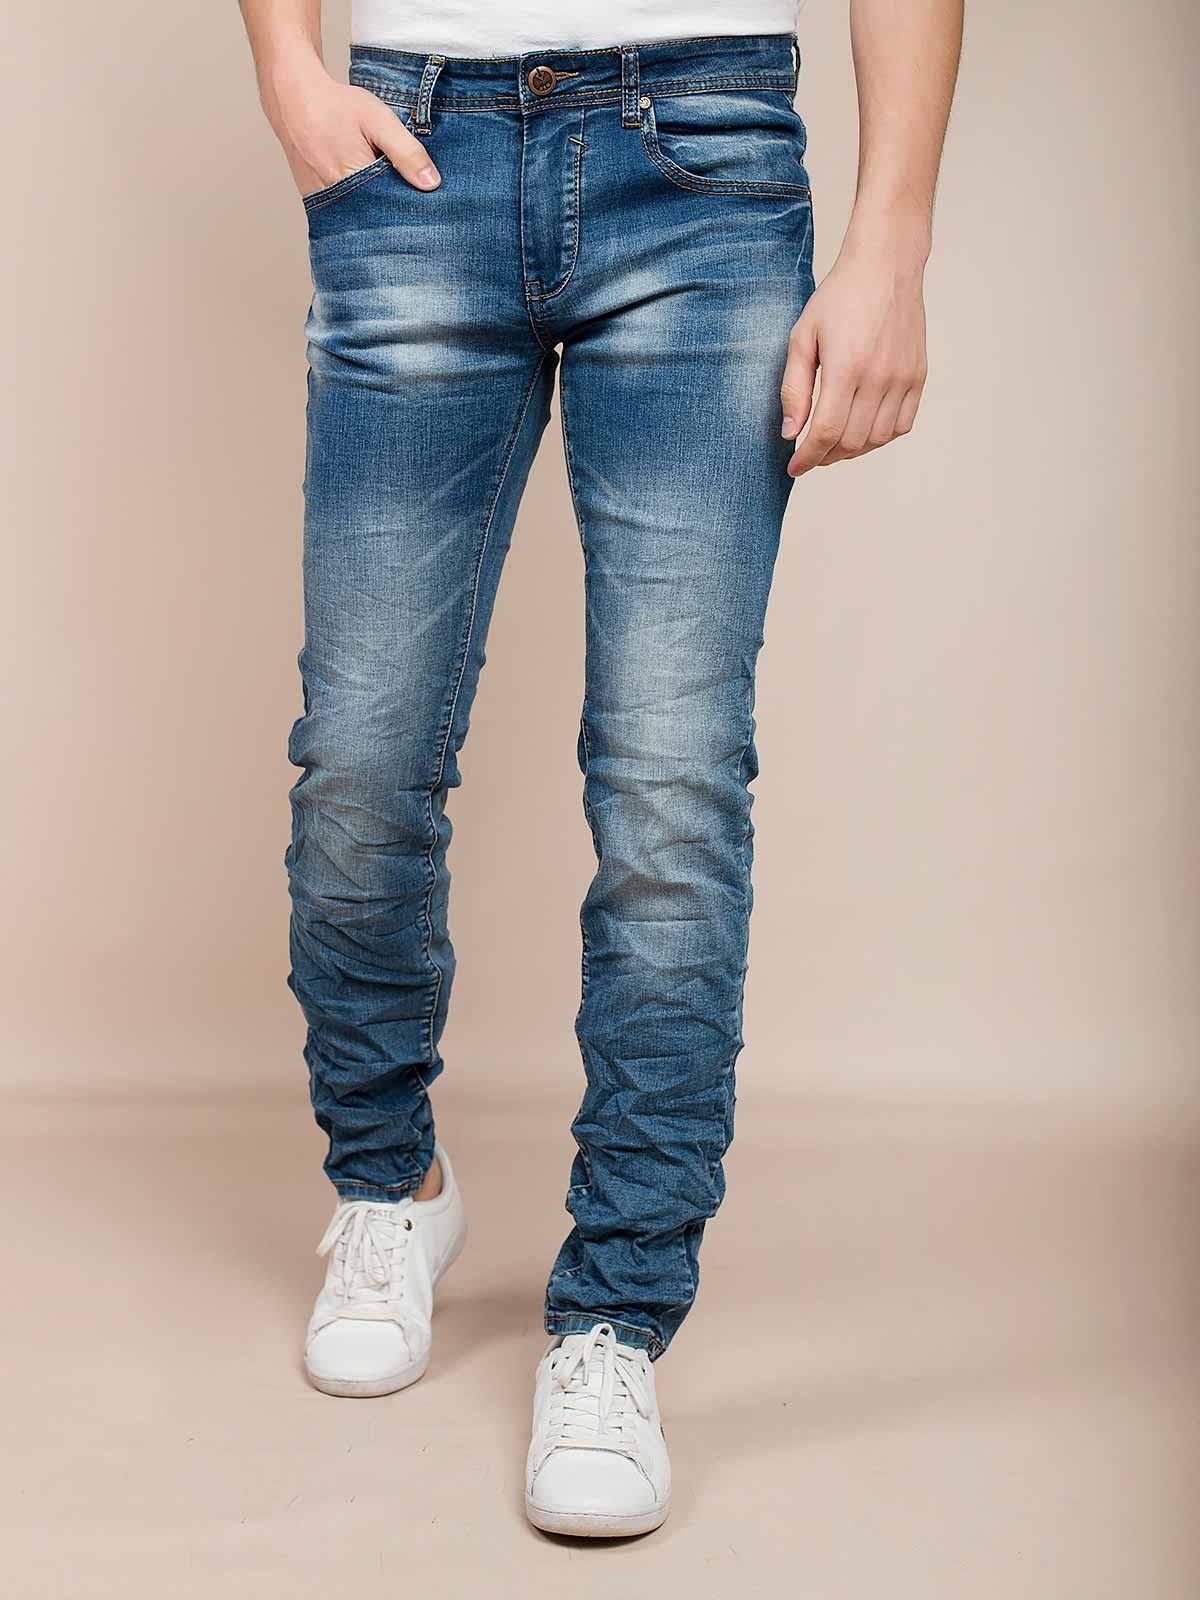 Calças ganga slim fit jeans